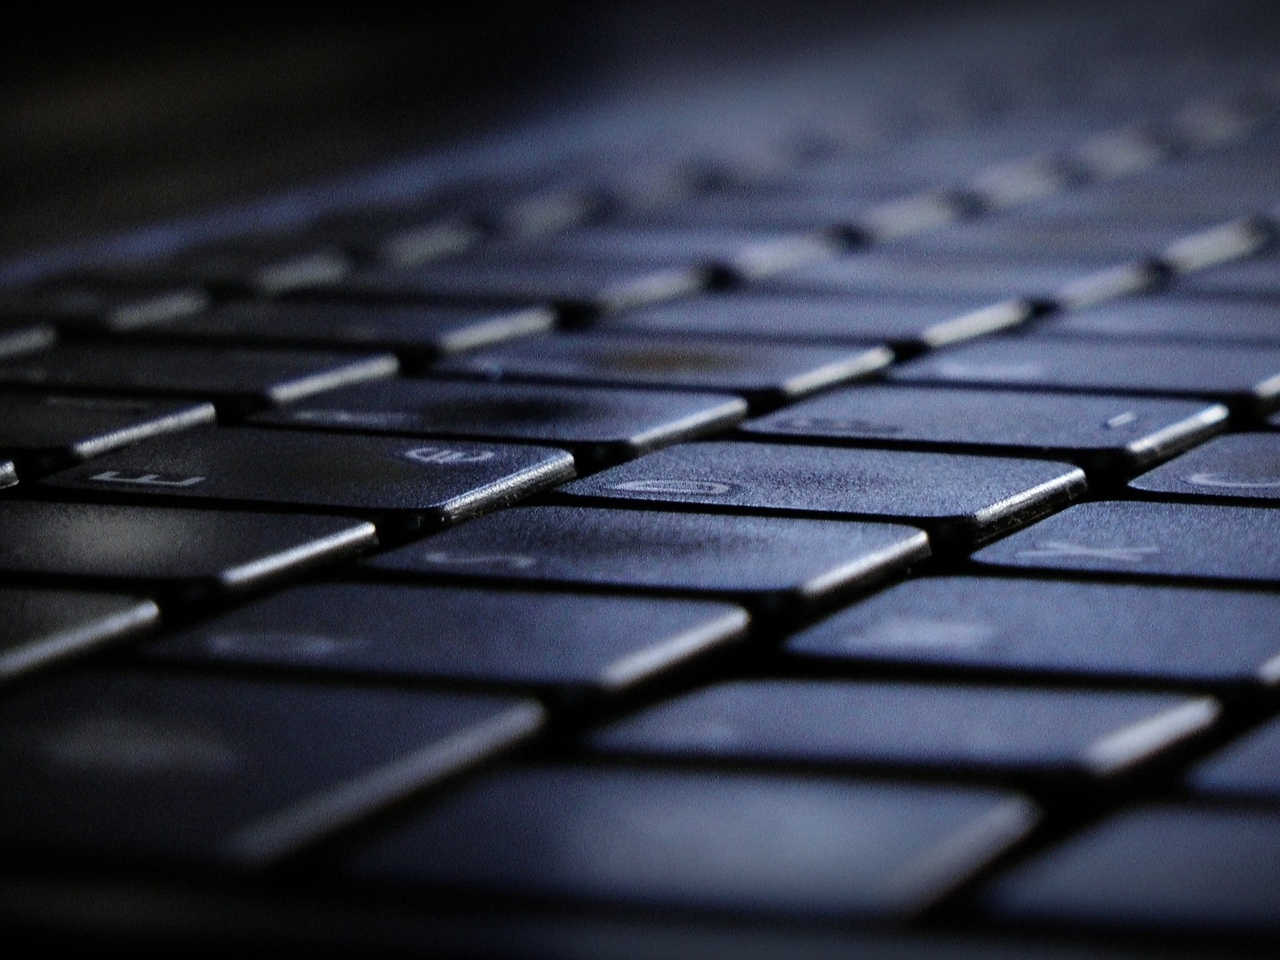 Рисунок клавиатуры компьютерной